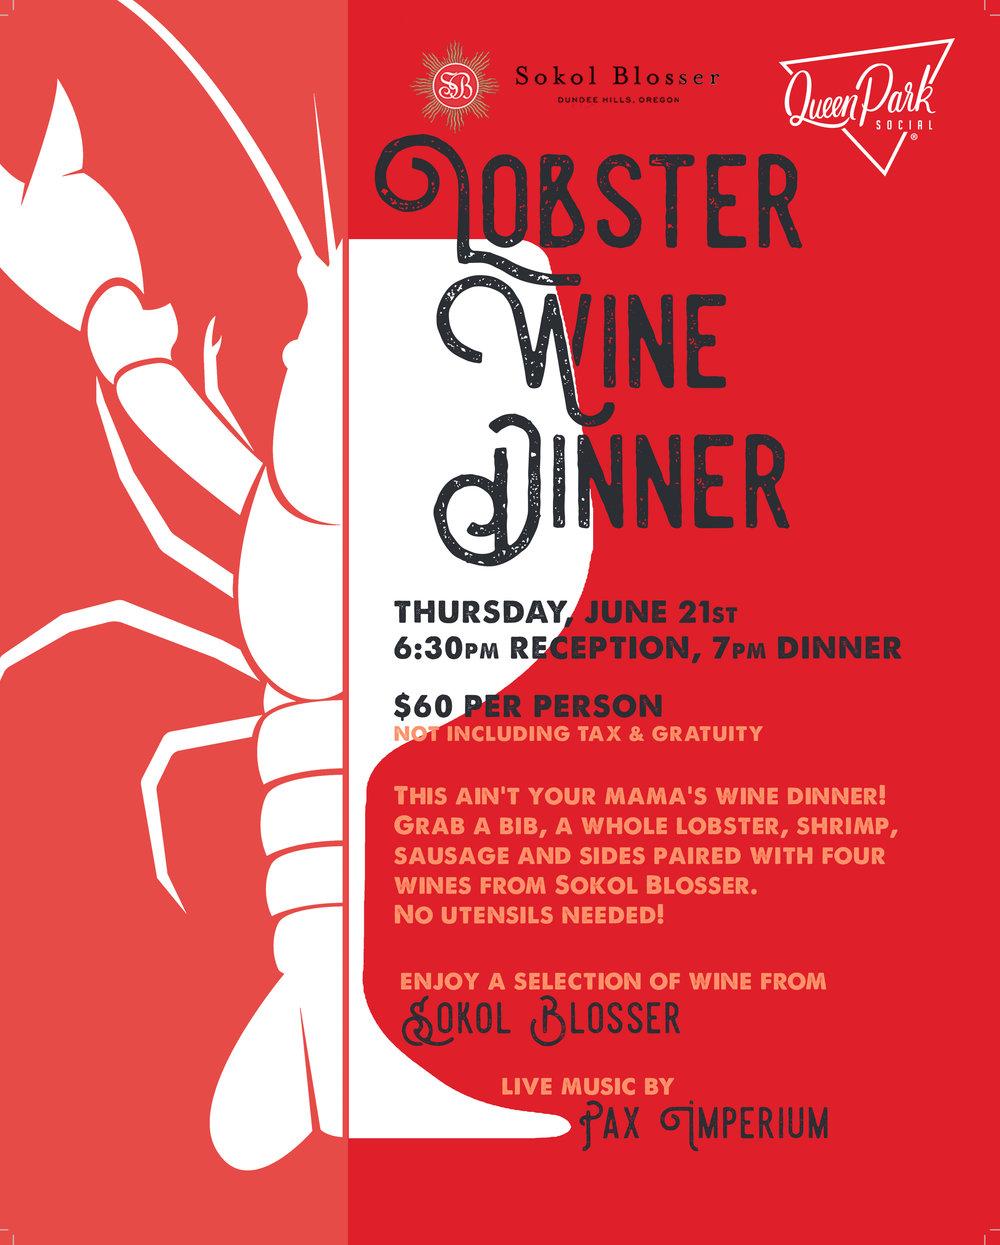 QPS-Lobster-Dinner.jpg